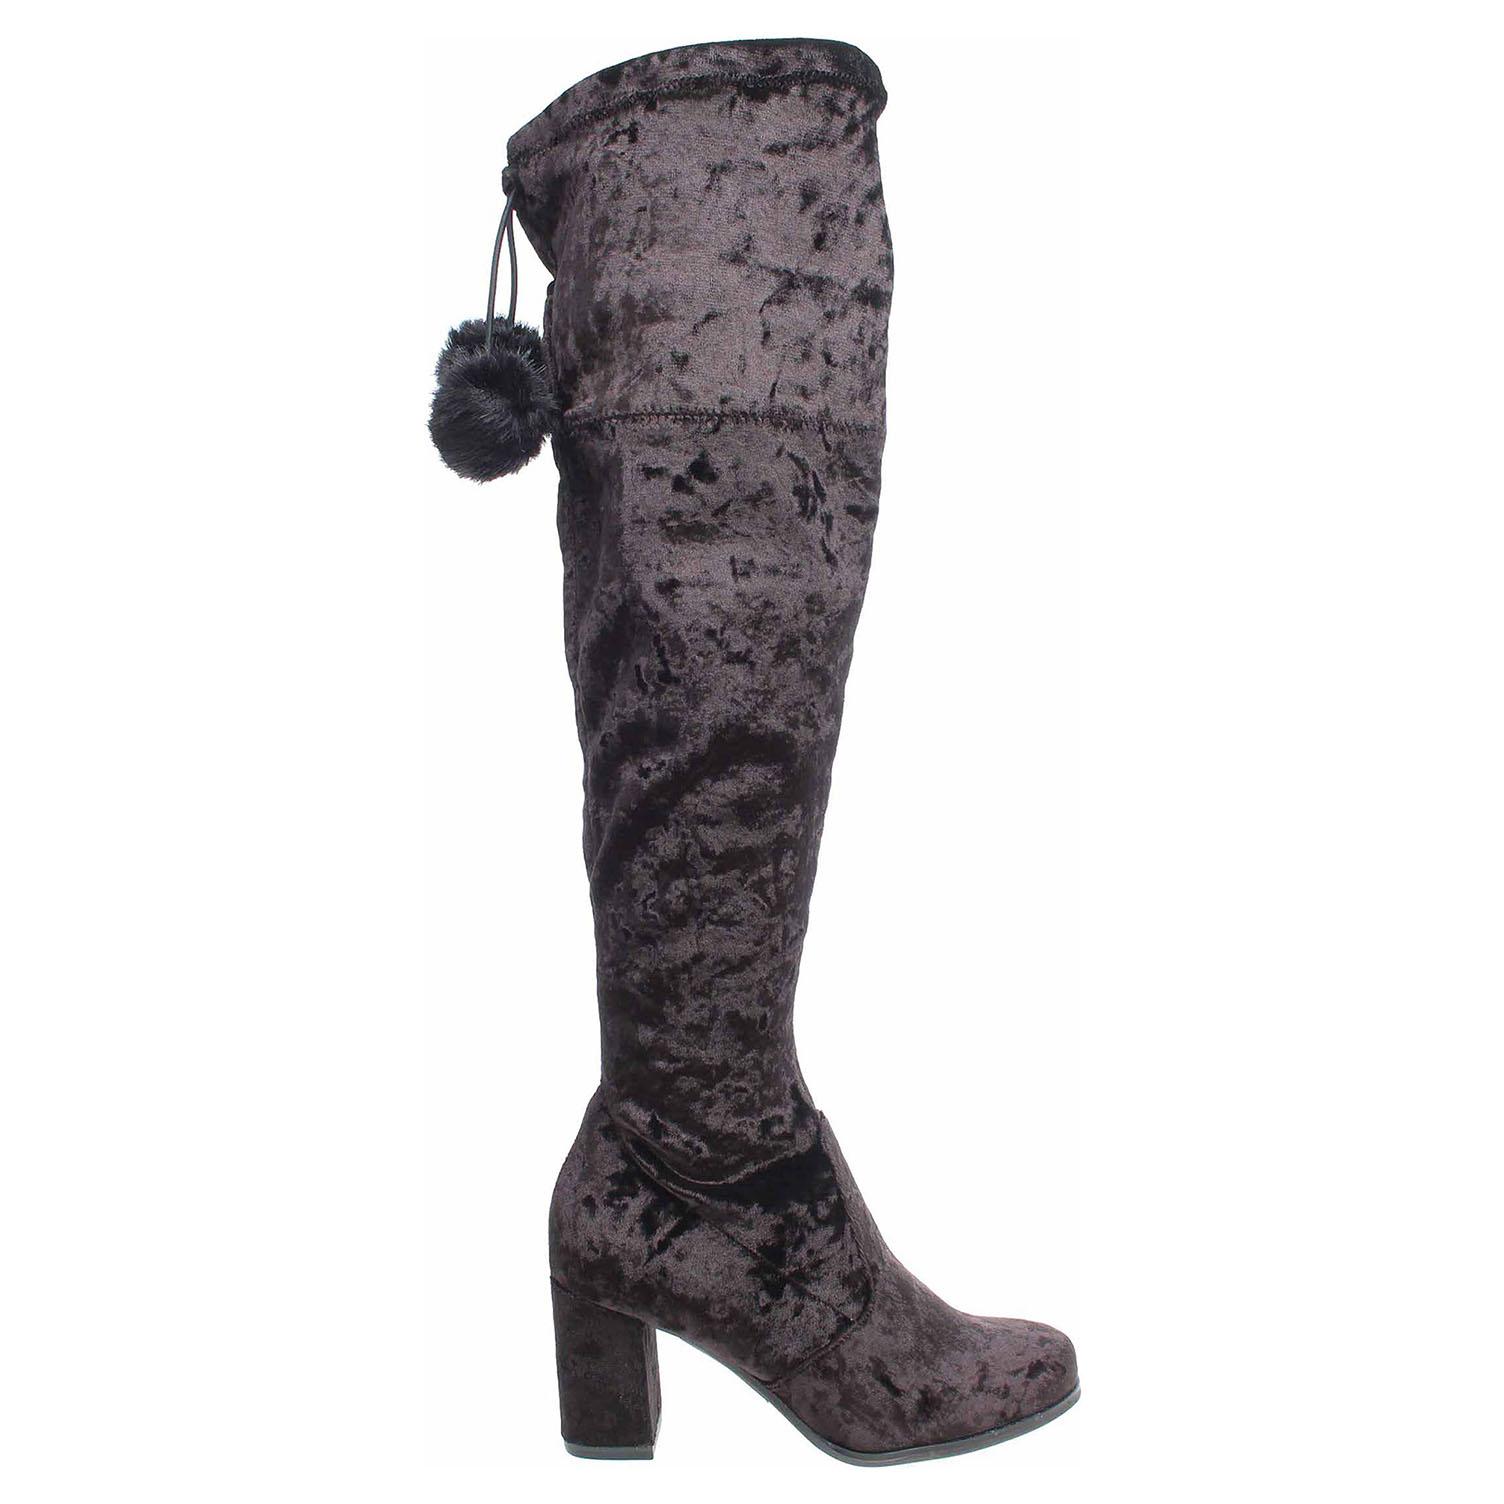 Ecco Tamaris dámské kozačky 1-25564-39 black velvet 22500834